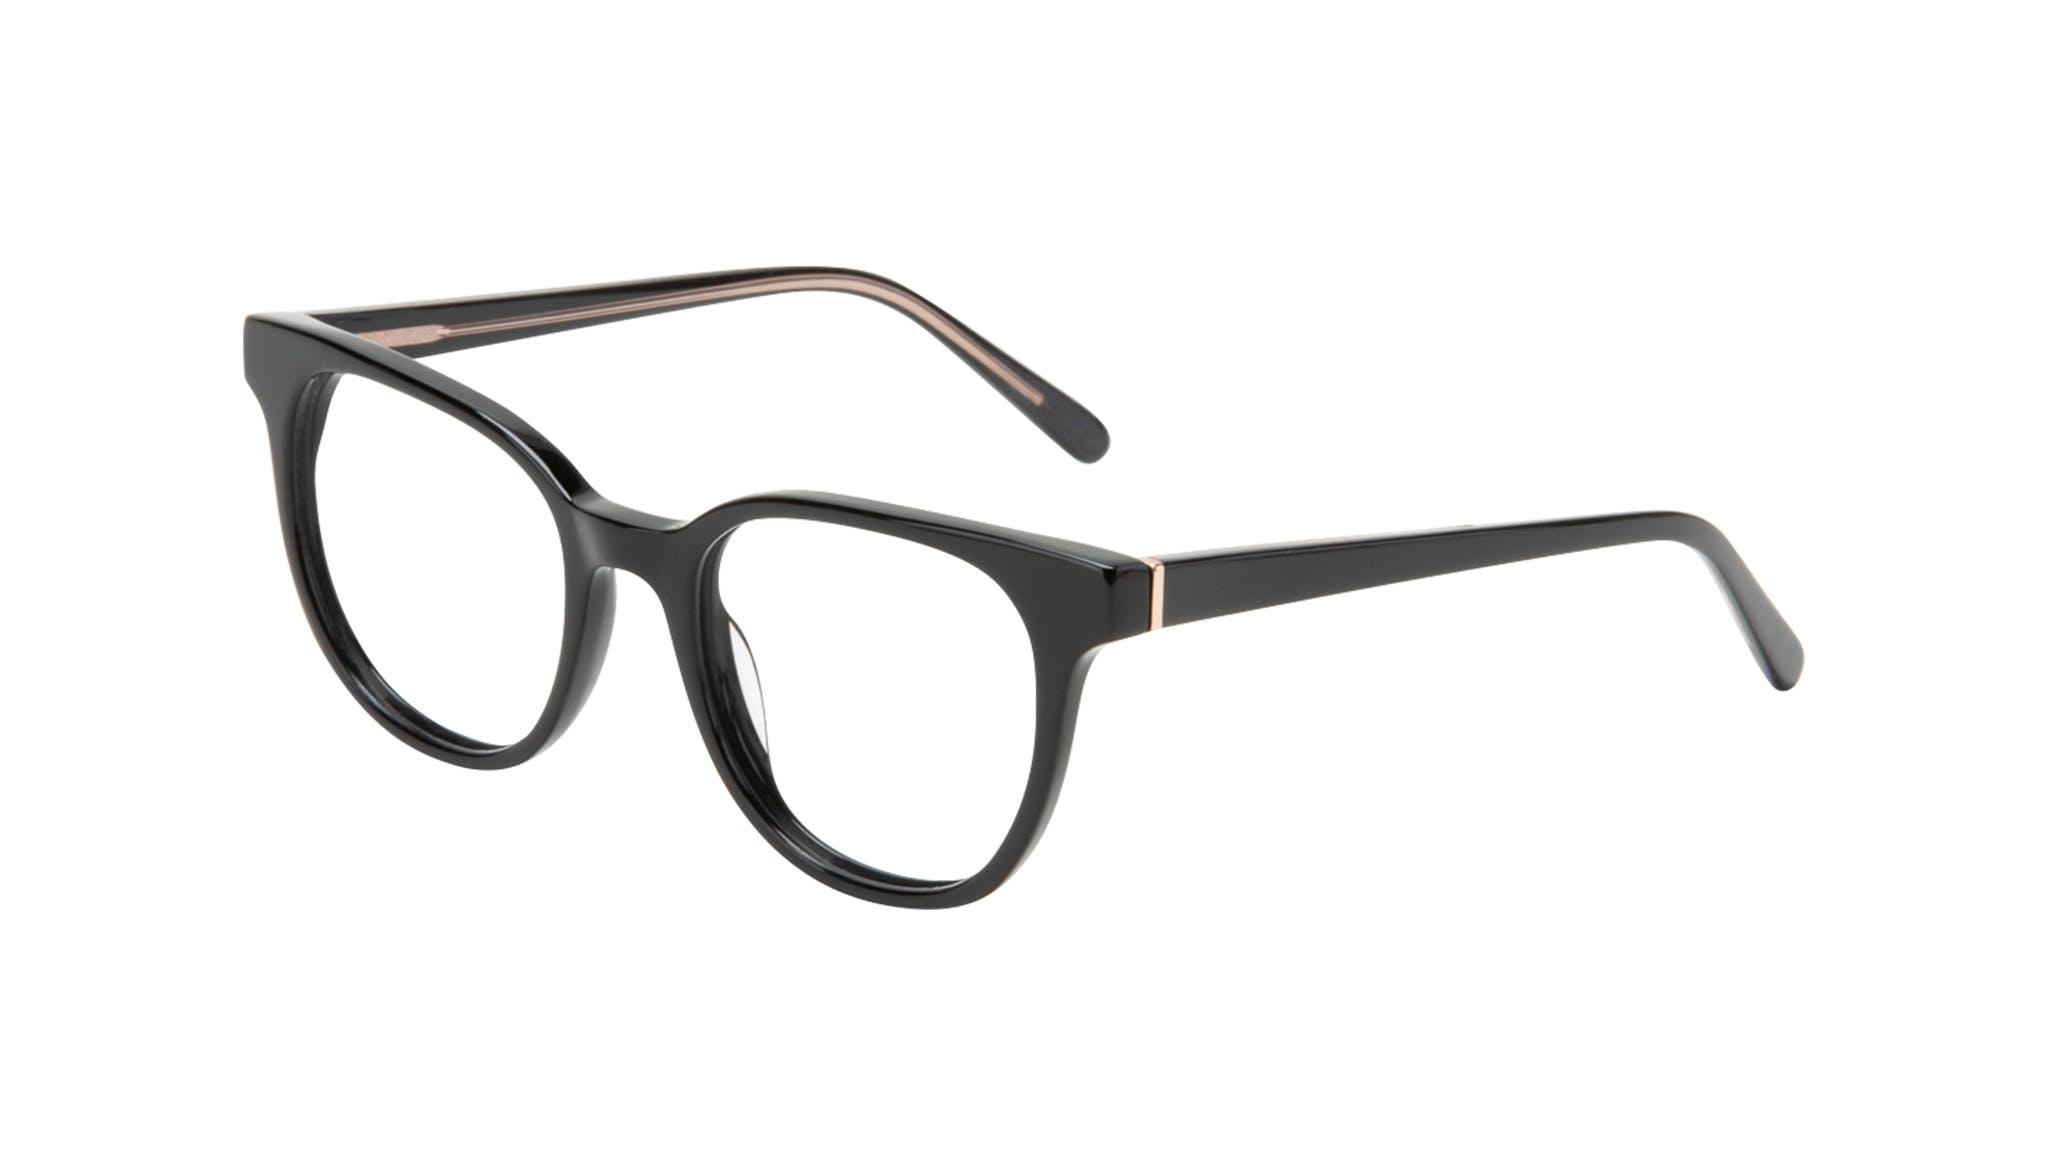 Affordable Fashion Glasses Square Eyeglasses Women Lively Black Tilt